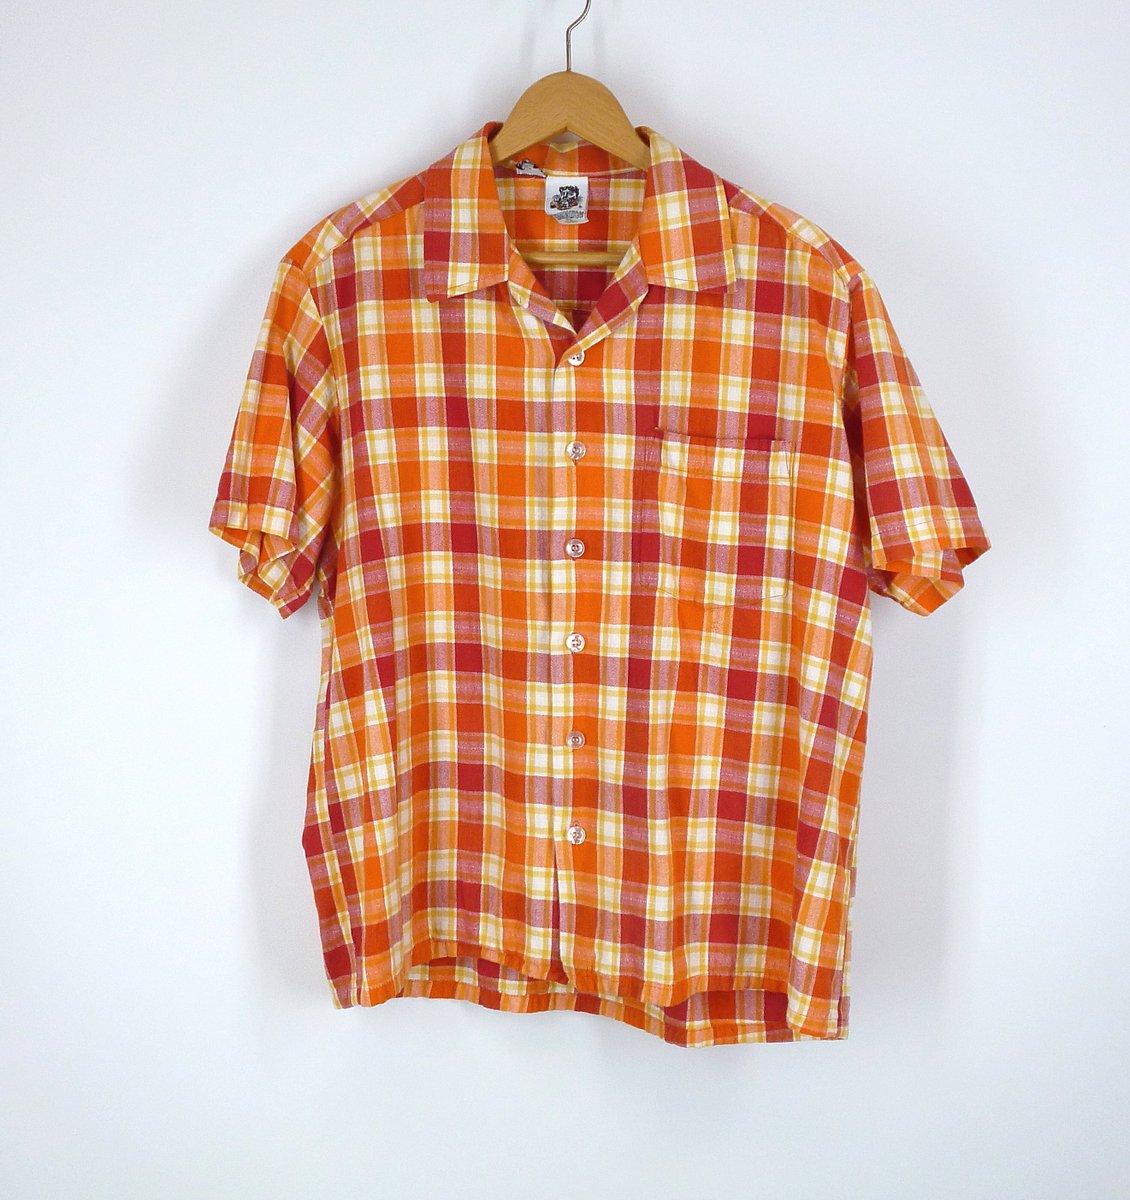 e1c38dce Kennington Plaid Shirt, Chambray Cotton, Vintage 1980s -90…  http://etsy.me/2zEp0qL #BlackRockVintage #KenningtonLtd  pic.twitter.com/nQO5Wg8y5D